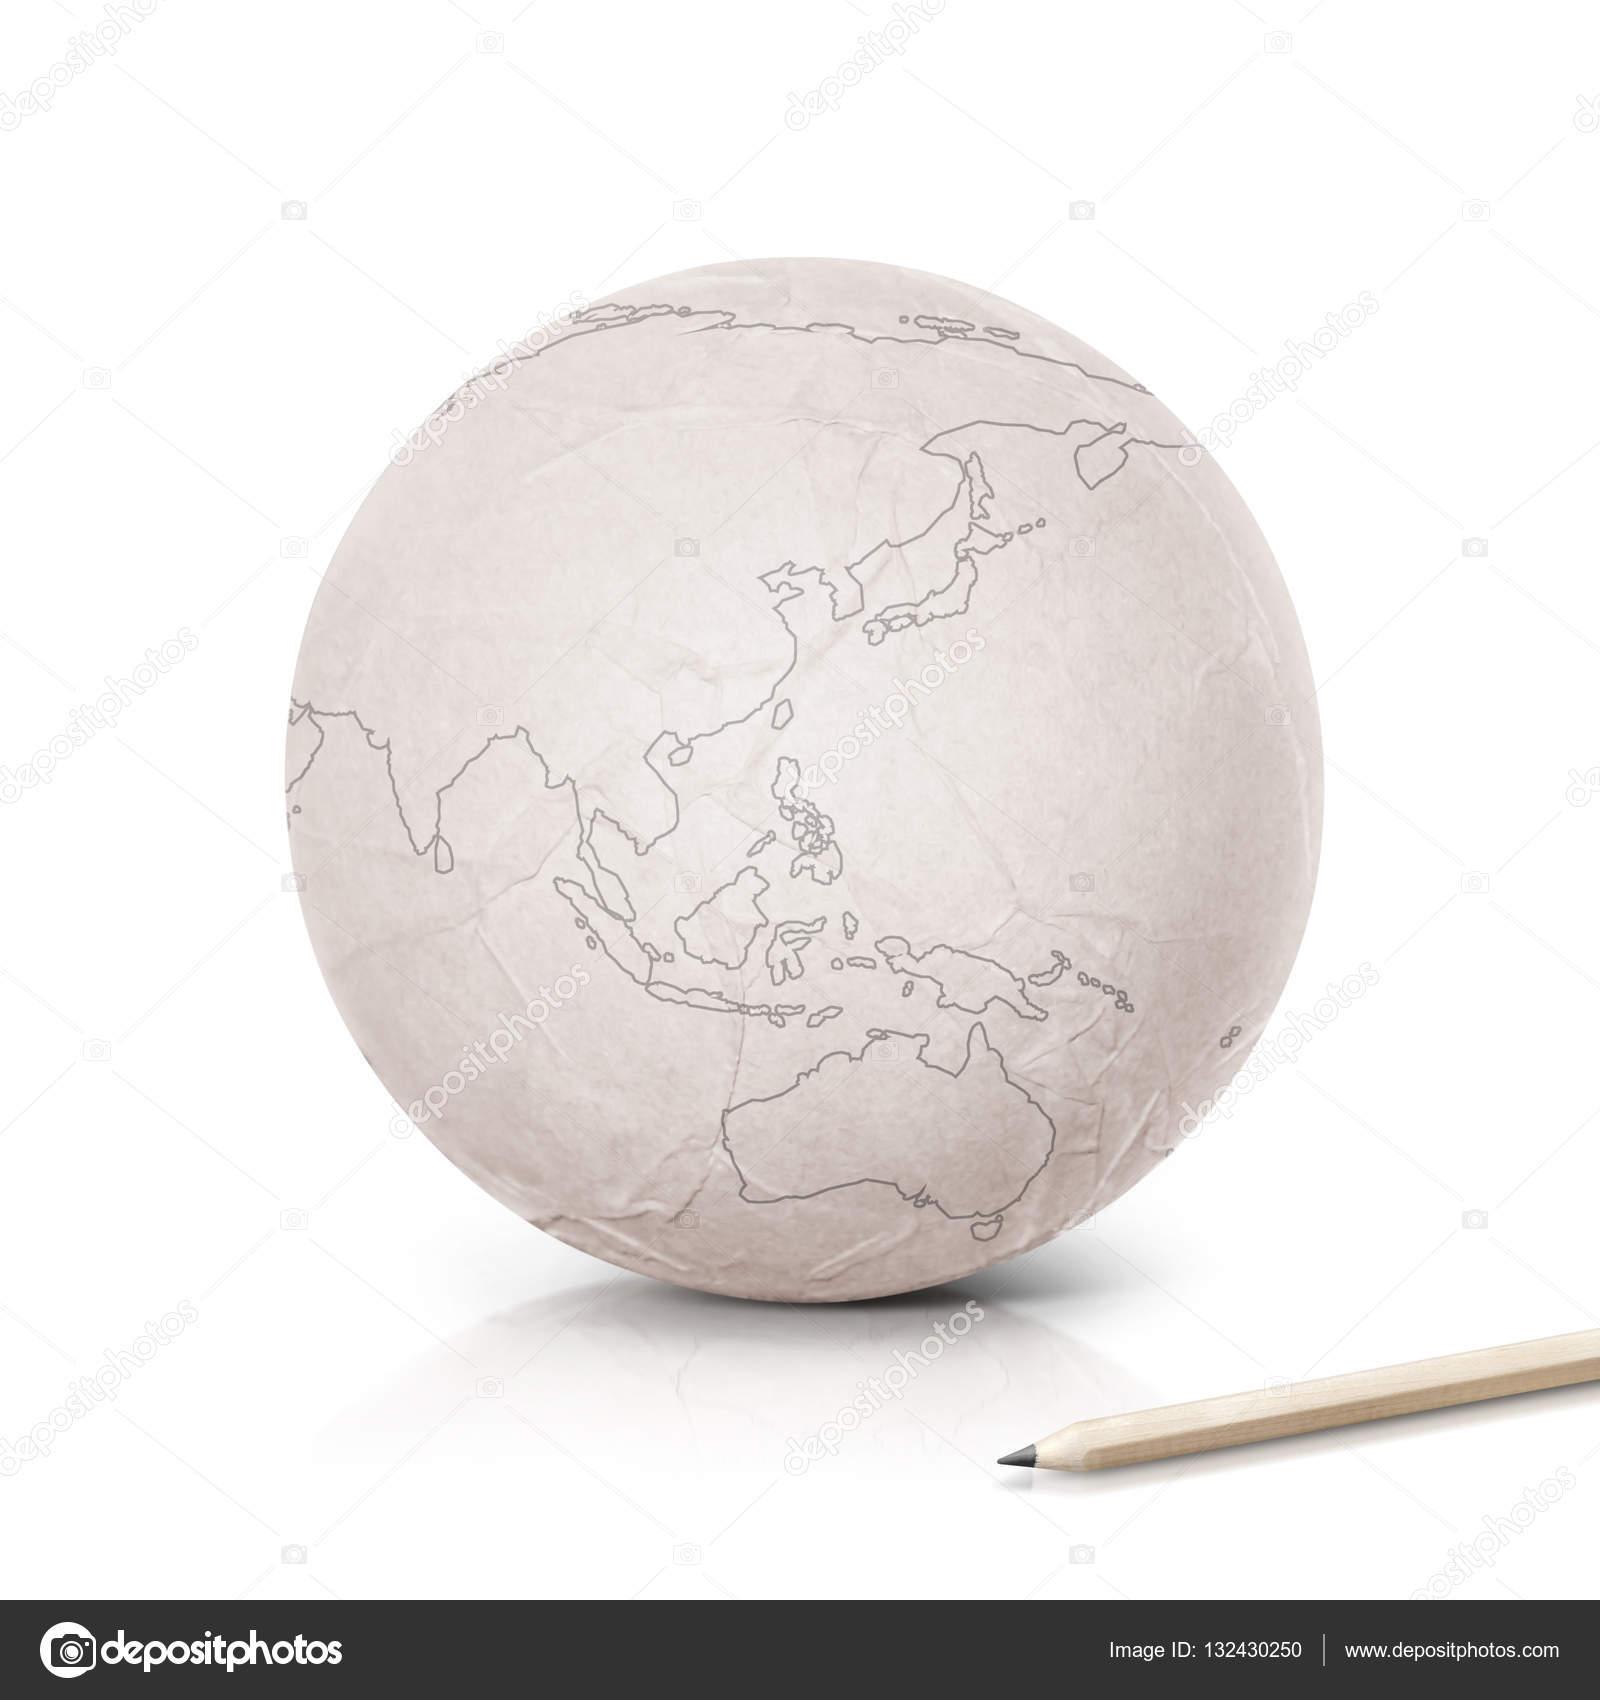 Stroke Asia & Australia map on paper globe — Stock Photo ... on map of china, map of japan, map of australasia, map of astrailia, island of south australia, map of iran and saudi arabia, united states map and australia, map of australia with cities, world map australia, map of africa, map of sydney australia, map of melbourne australia, map asia pacific rim, map of australia climate regions, world with japan and australia, map of australia for teens, map of india, south africa and australia, a map of australia, time in rockhampton australia,